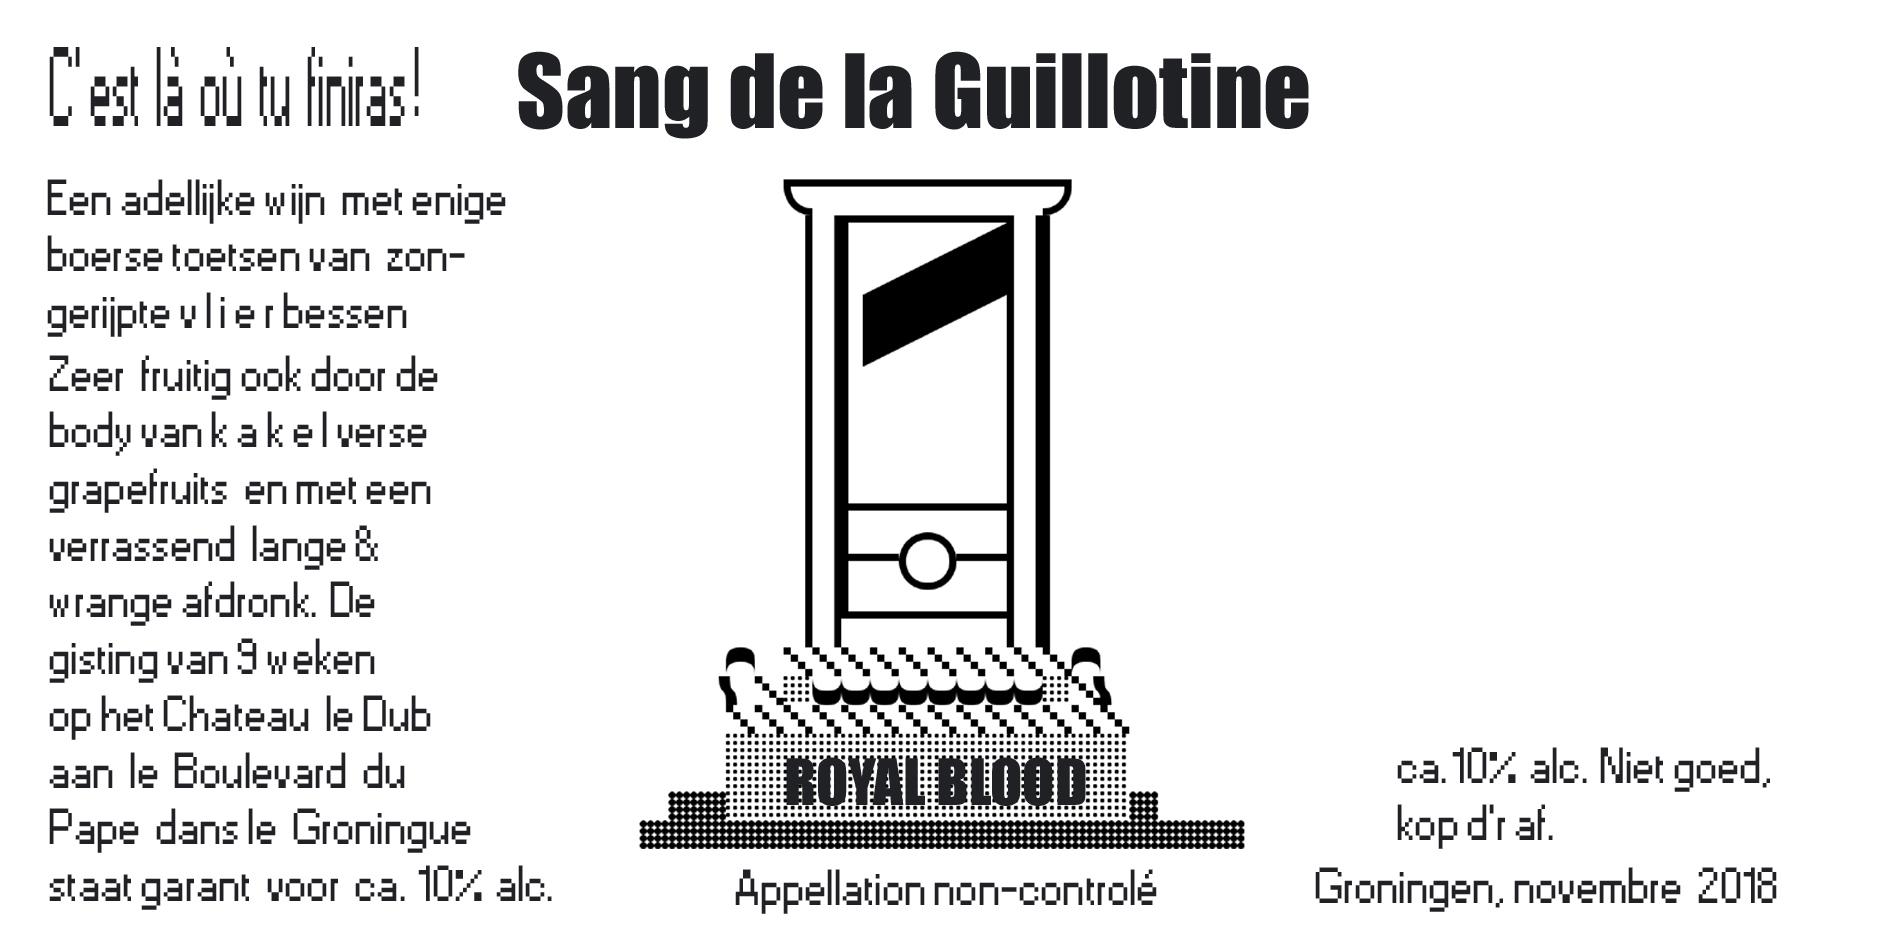 sang-de-la-guillotine-etiket